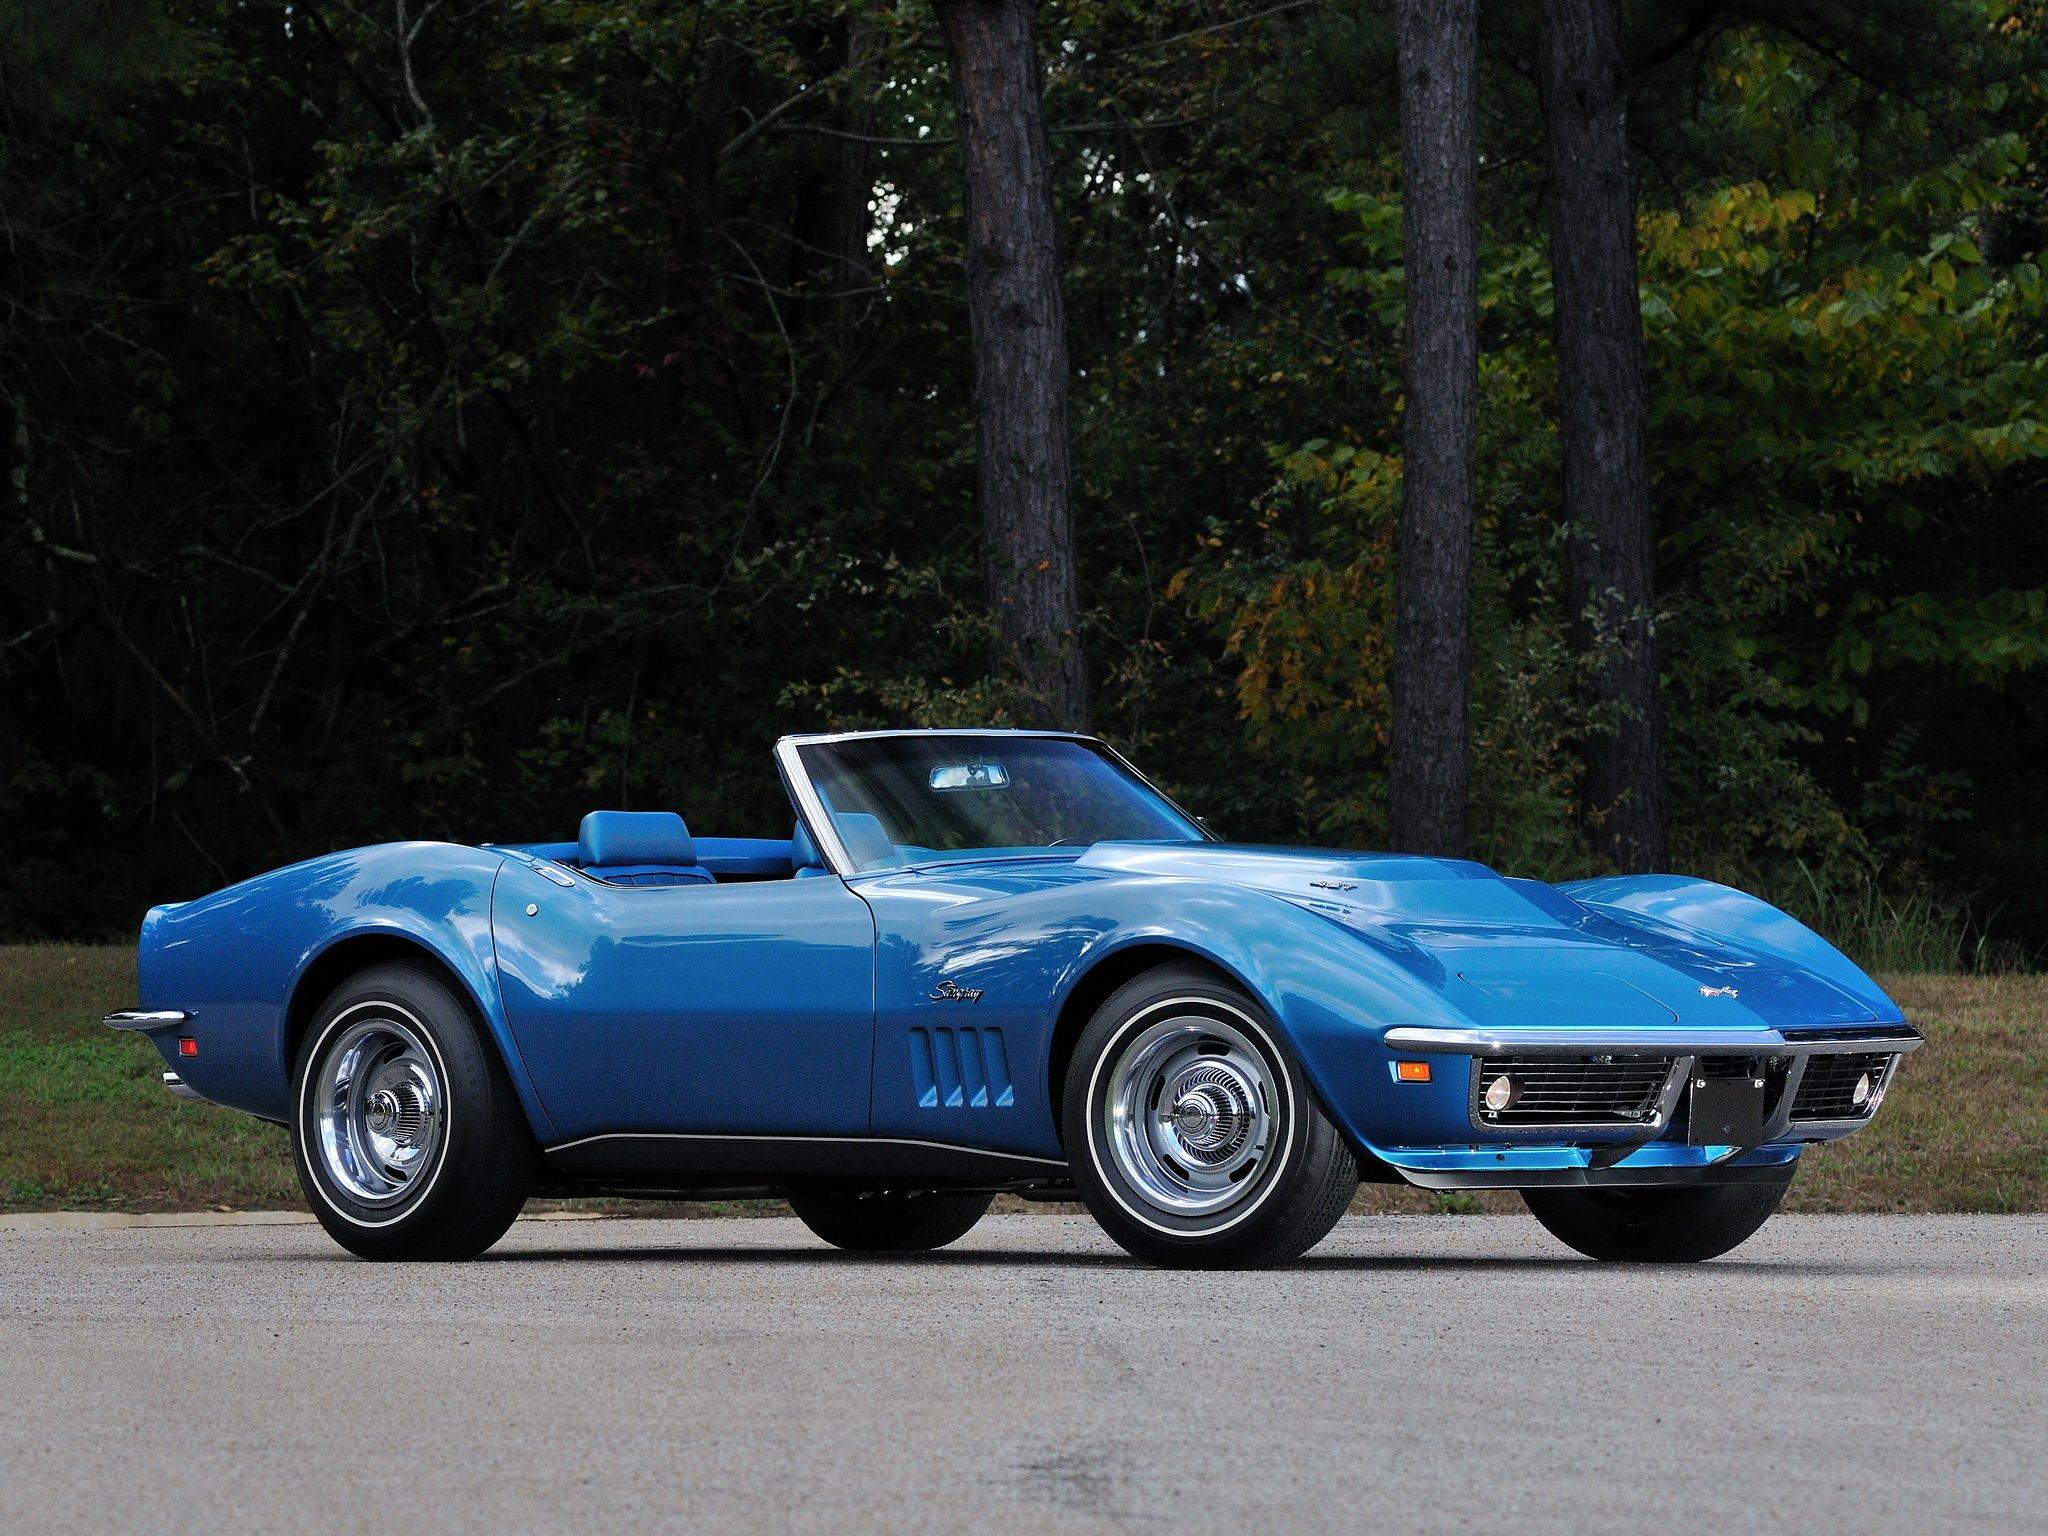 1969 chevrolet corvette stingray l88 427 convertible c 3 muscle